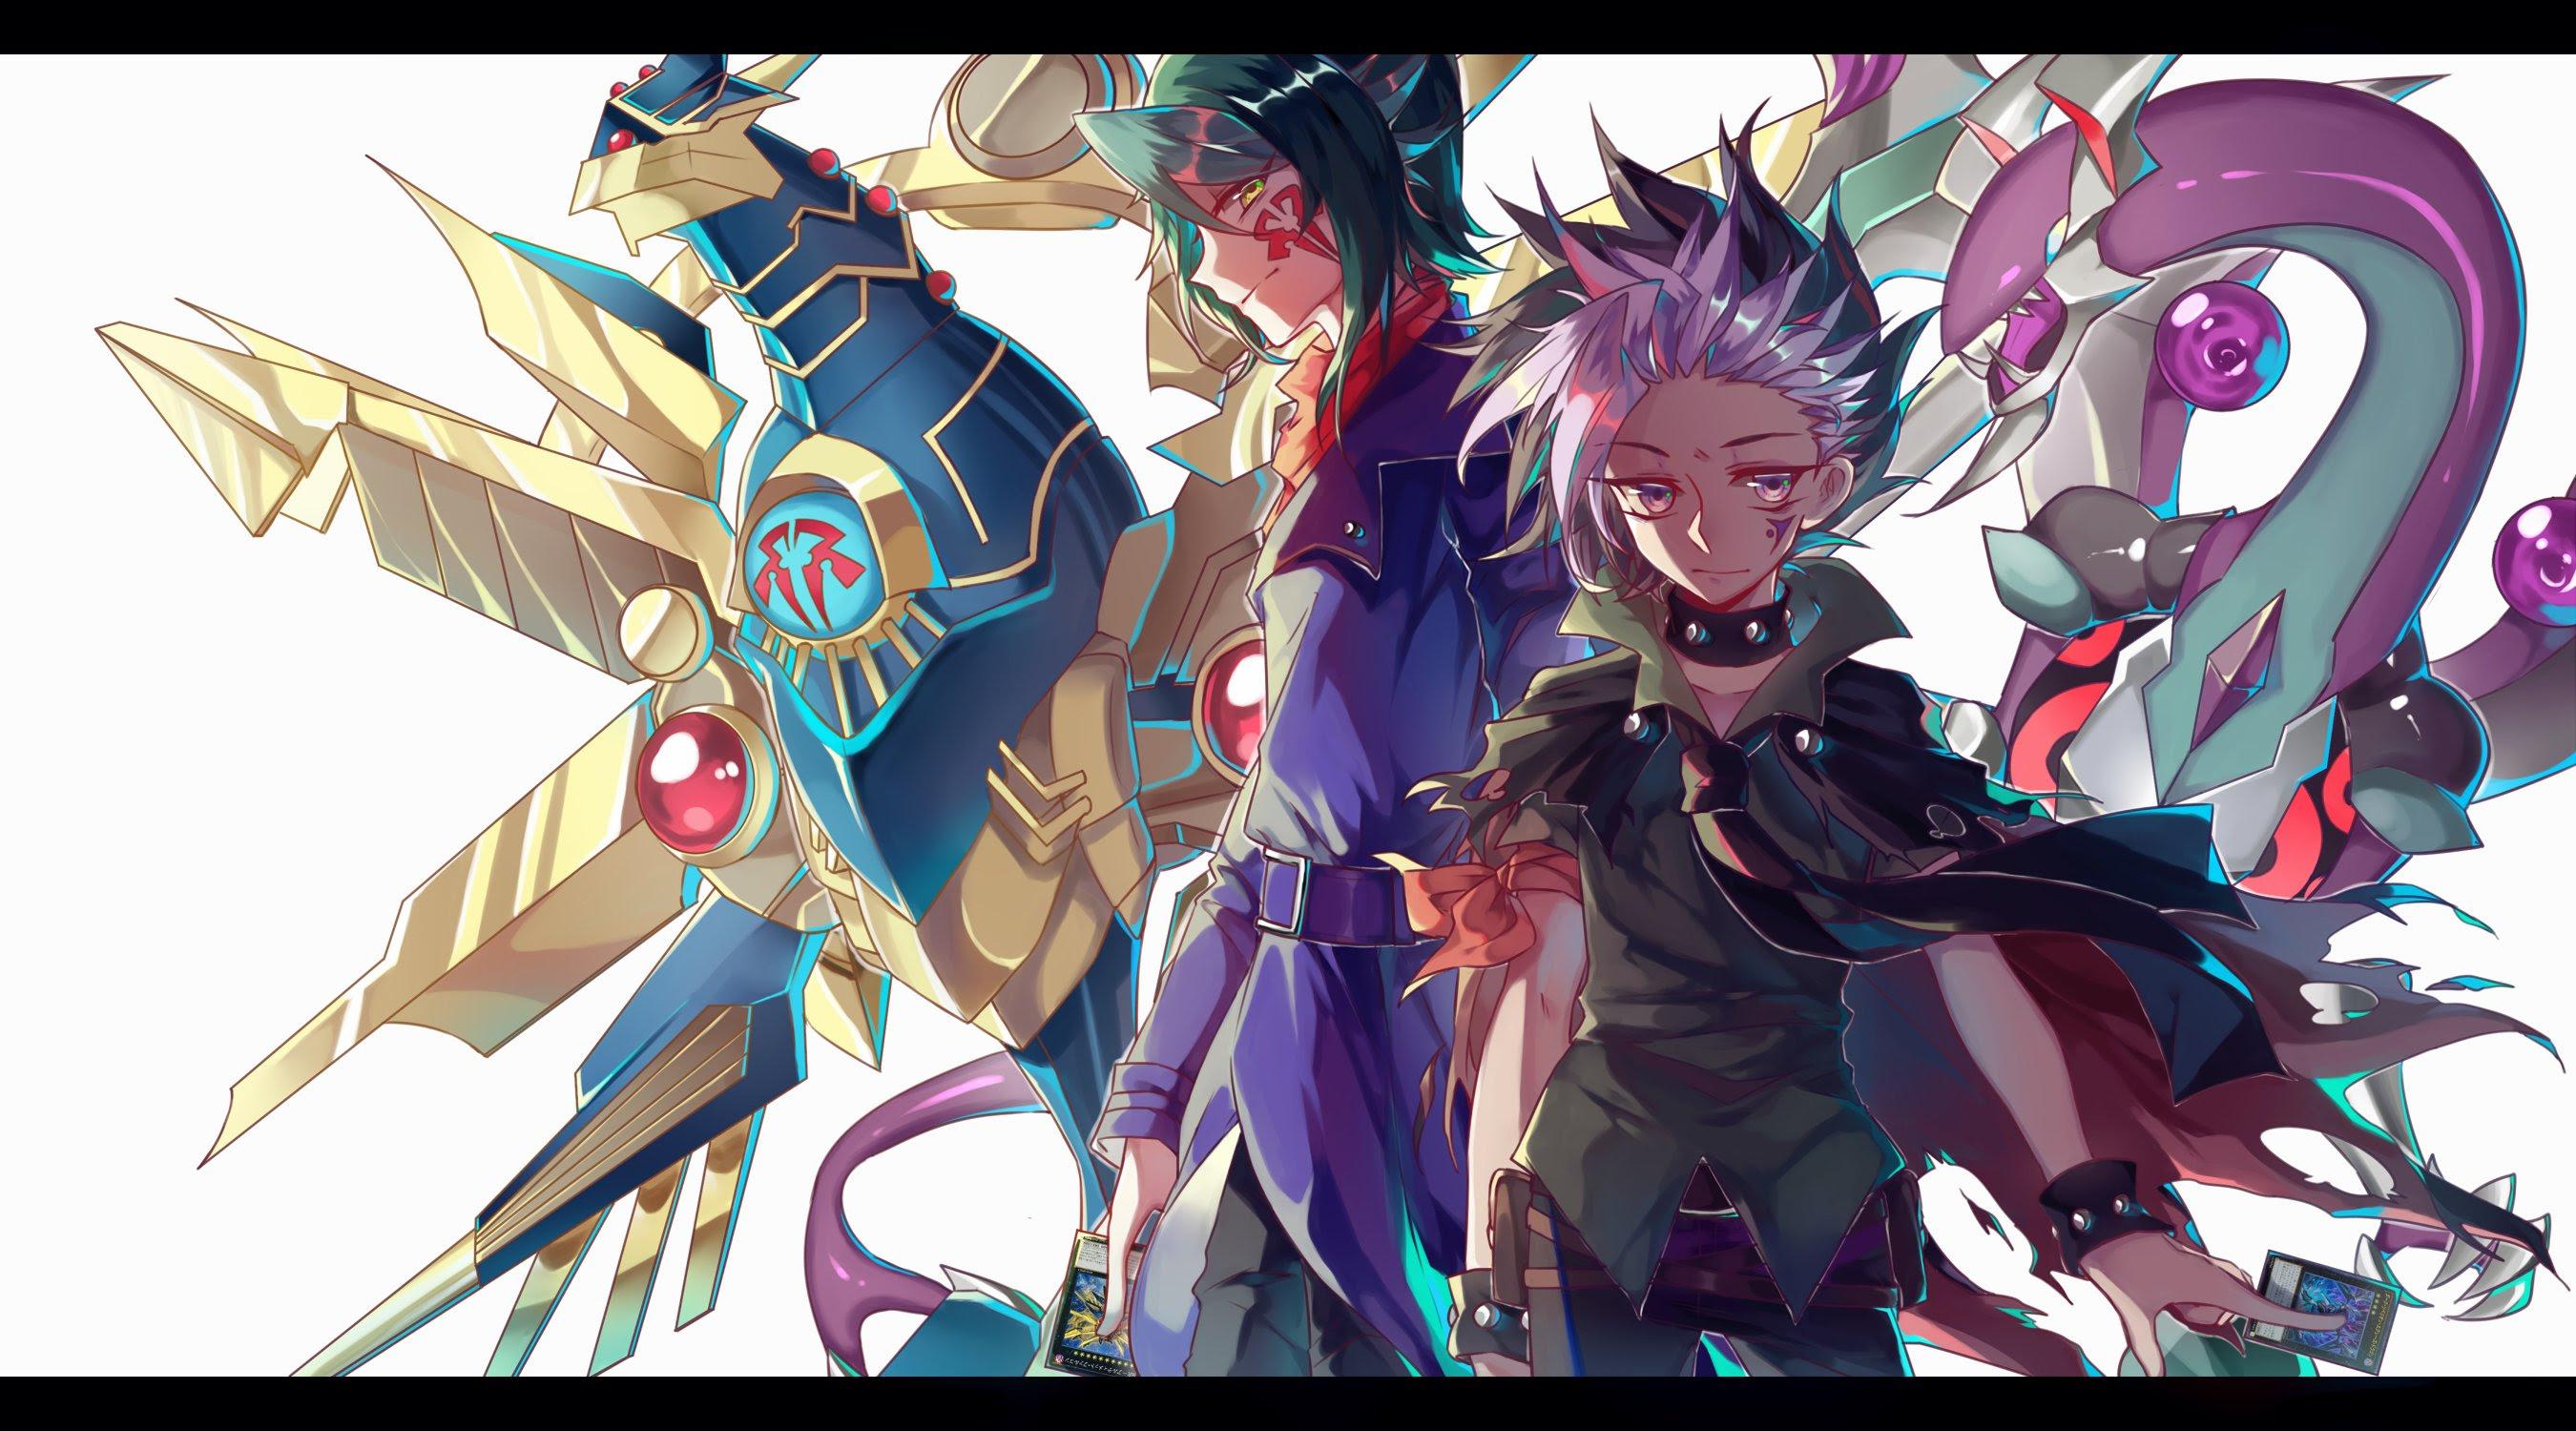 Yugioh Arcv Wallpapers Anime Hq Yugioh Arcv Pictures 4k Wallpapers